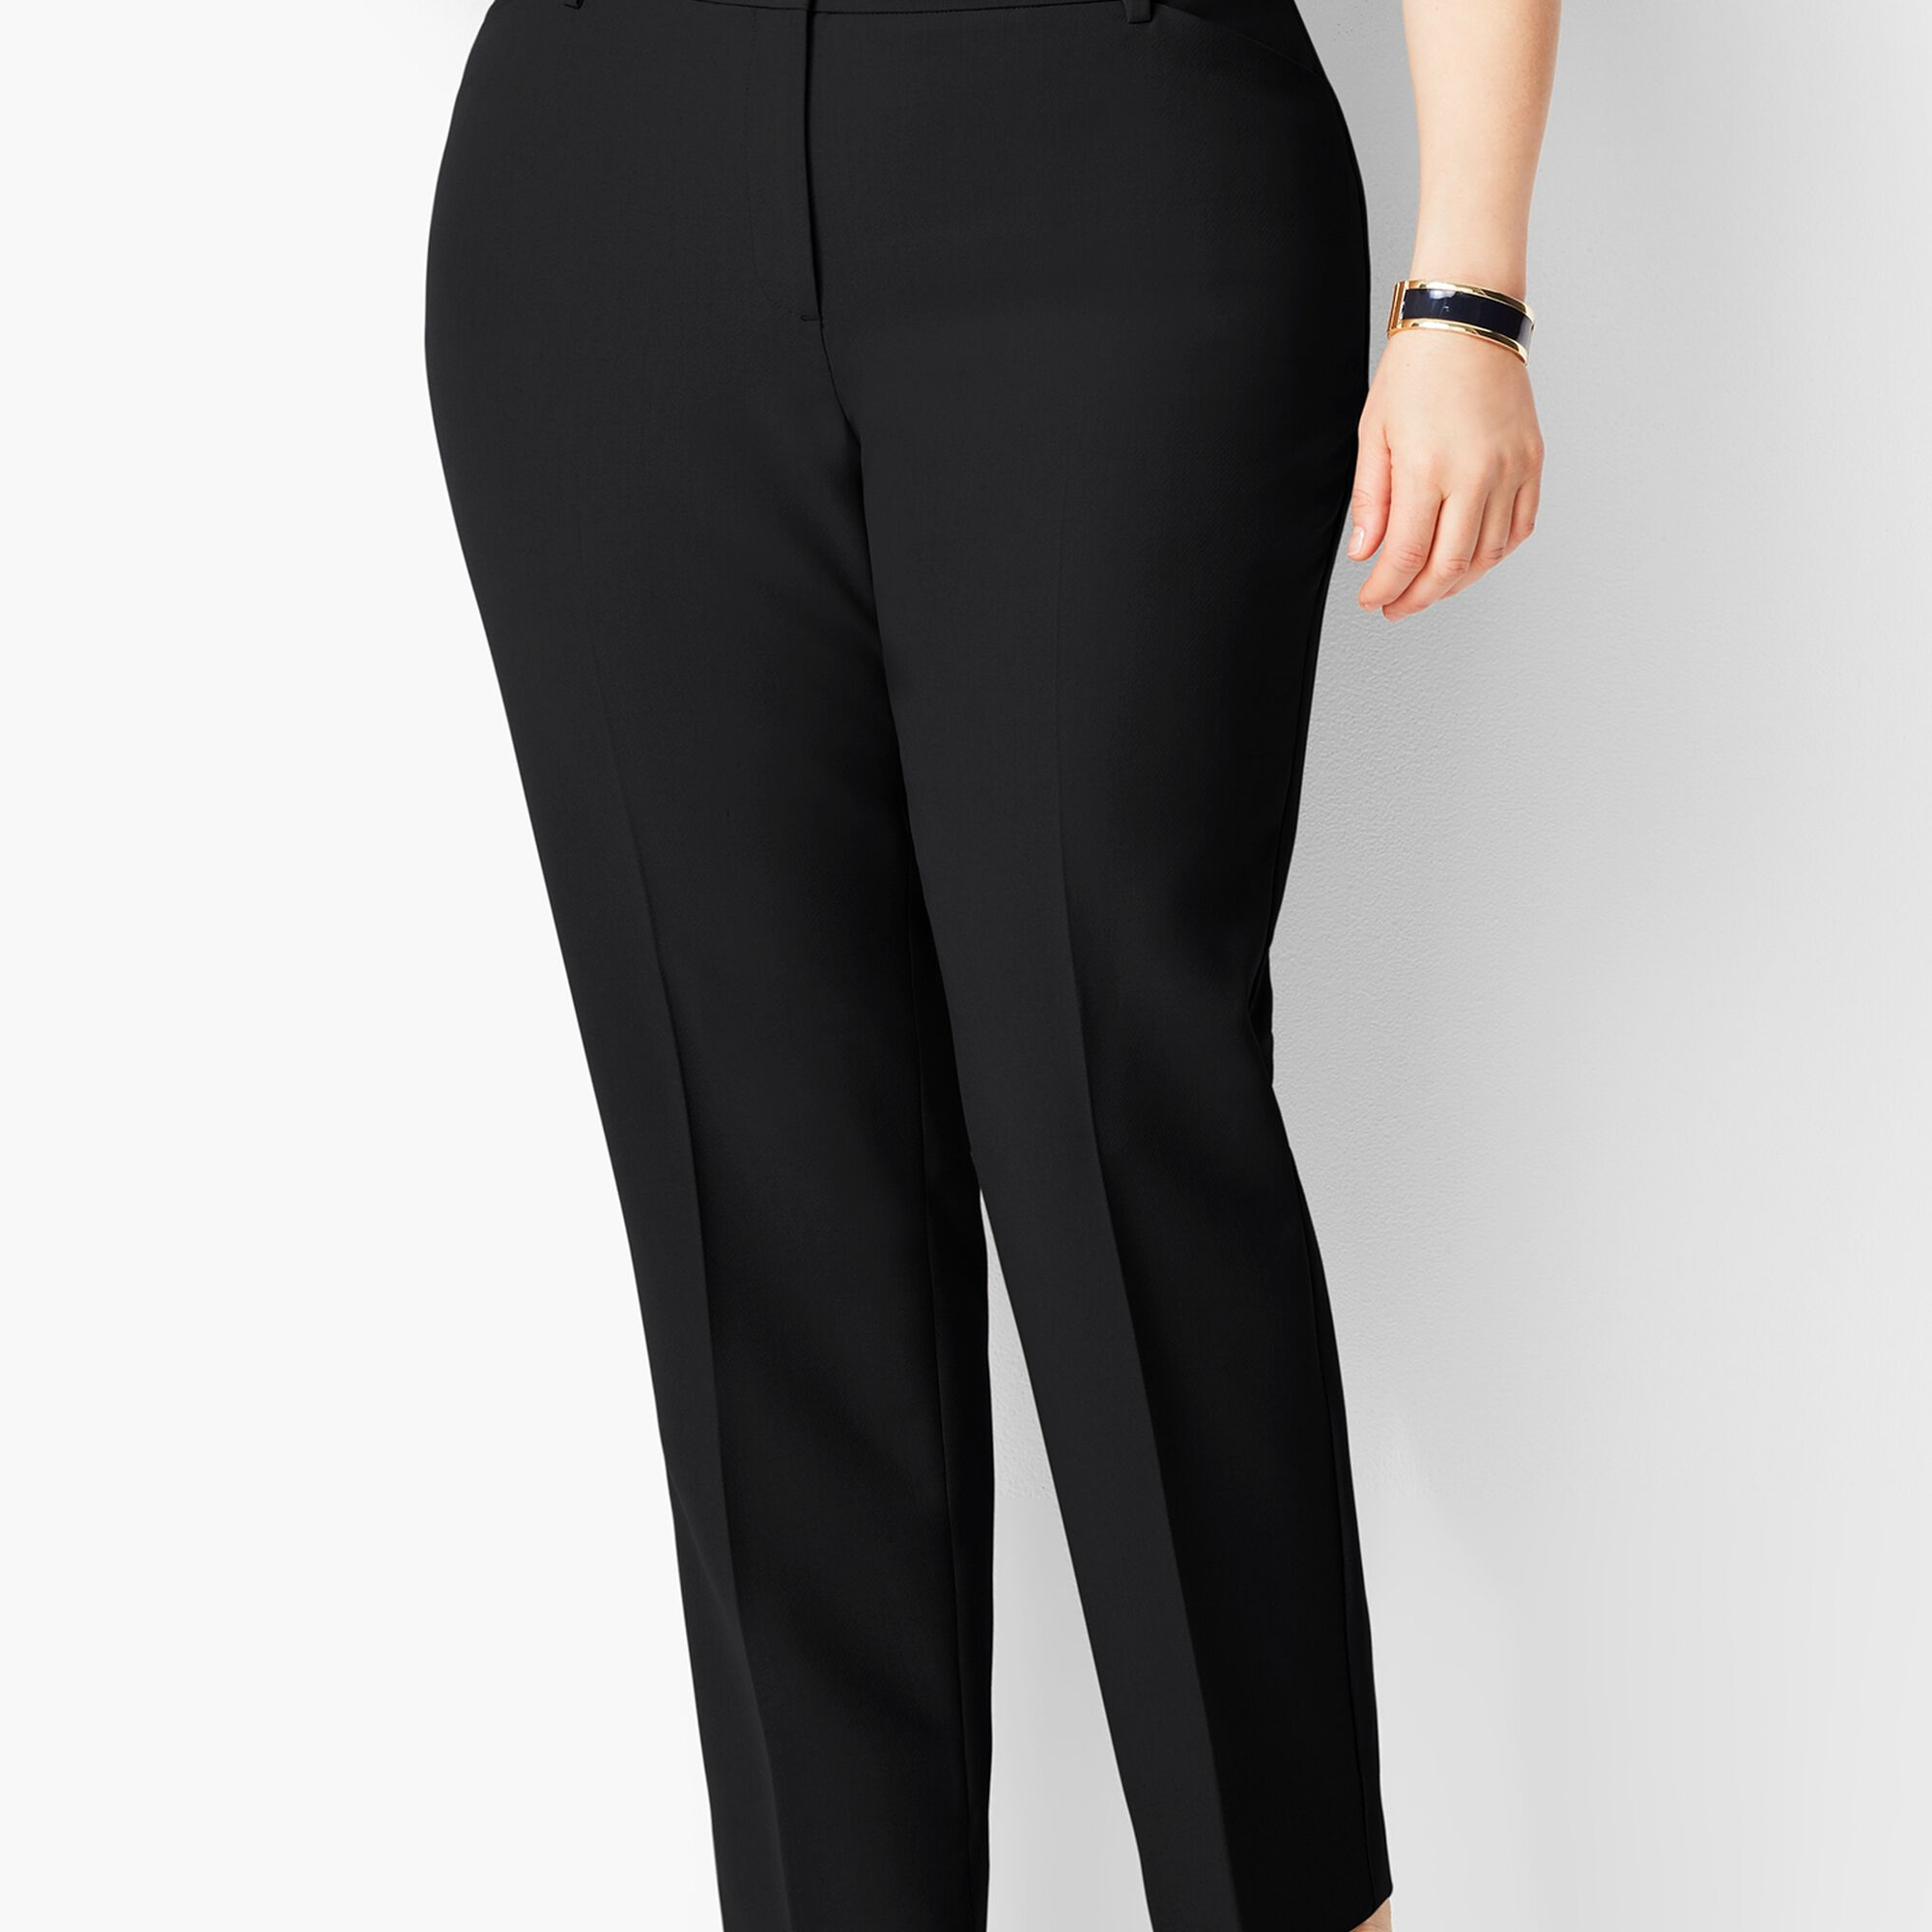 c9a57b7d839 Images. Plus Size High-Waist Tailored Ankle Pant - Curvy Fit